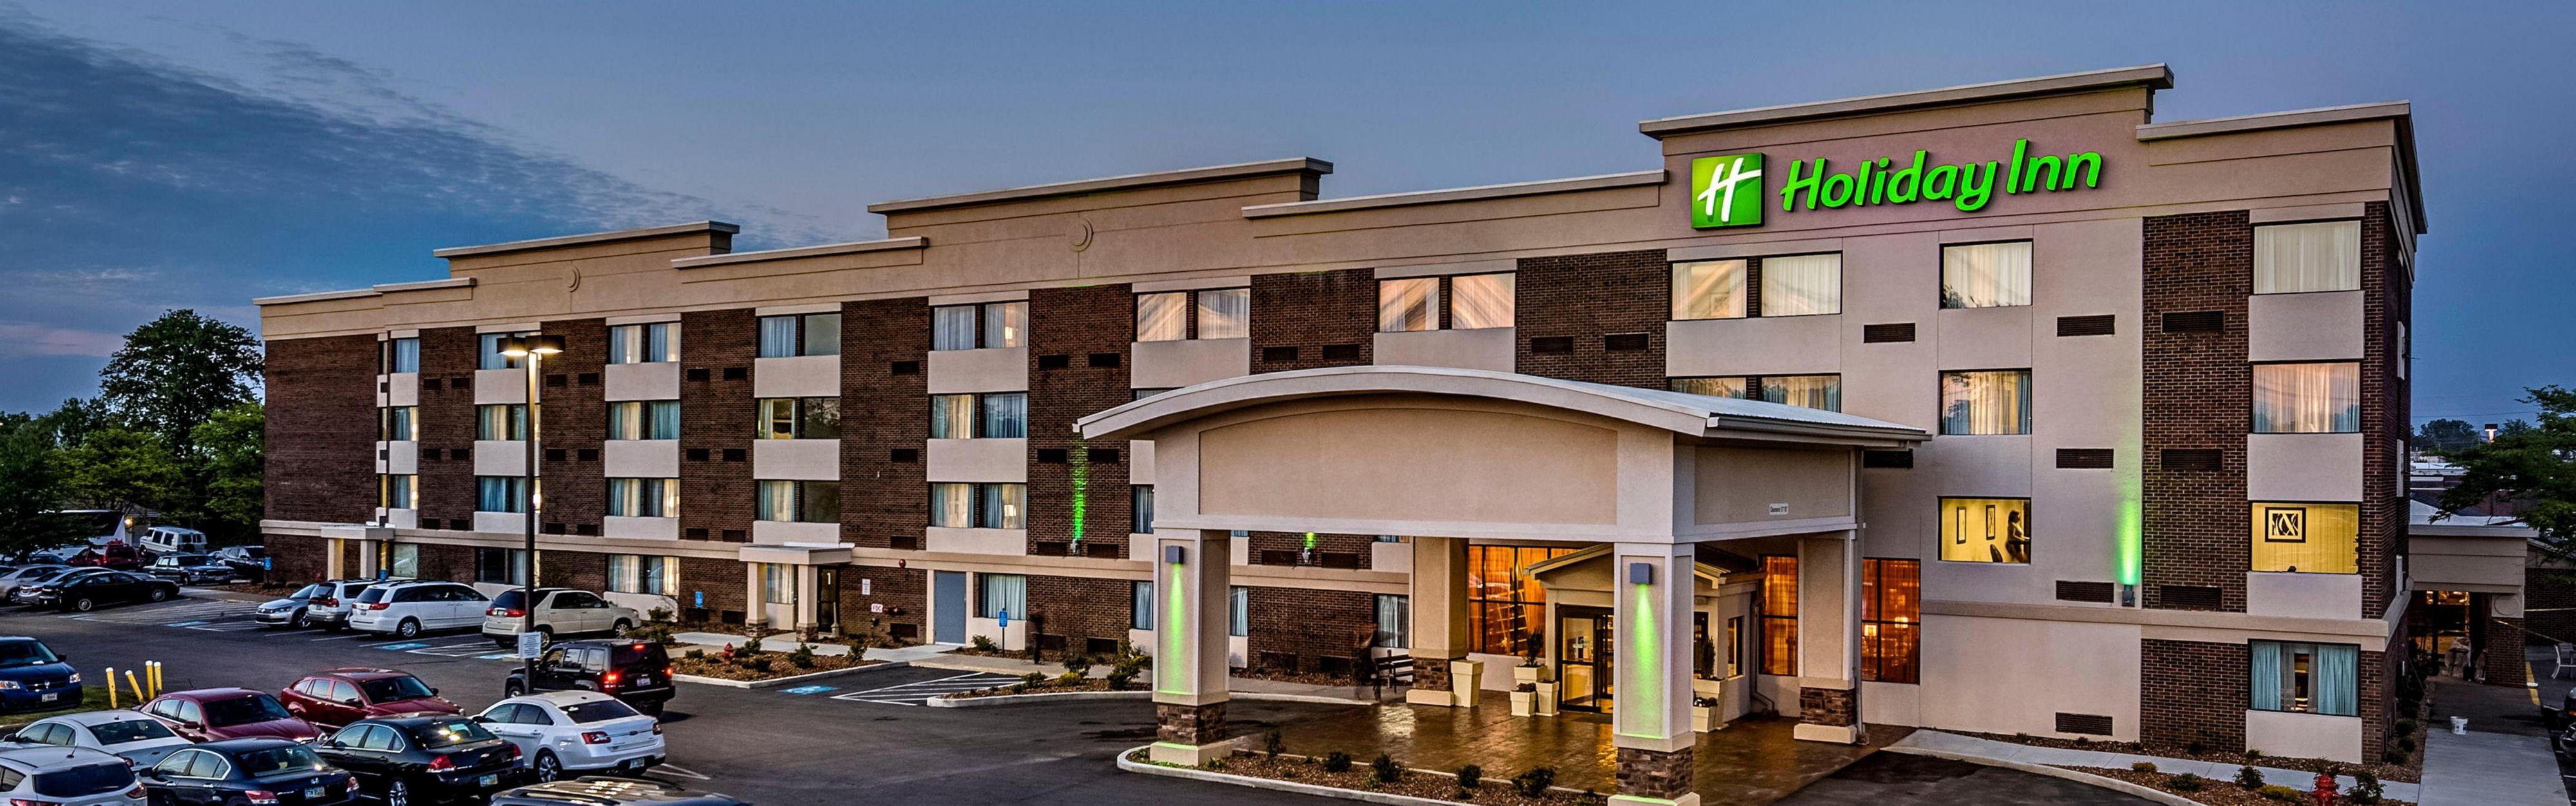 Holiday Inn Cleveland Northeast - Mentor image 0